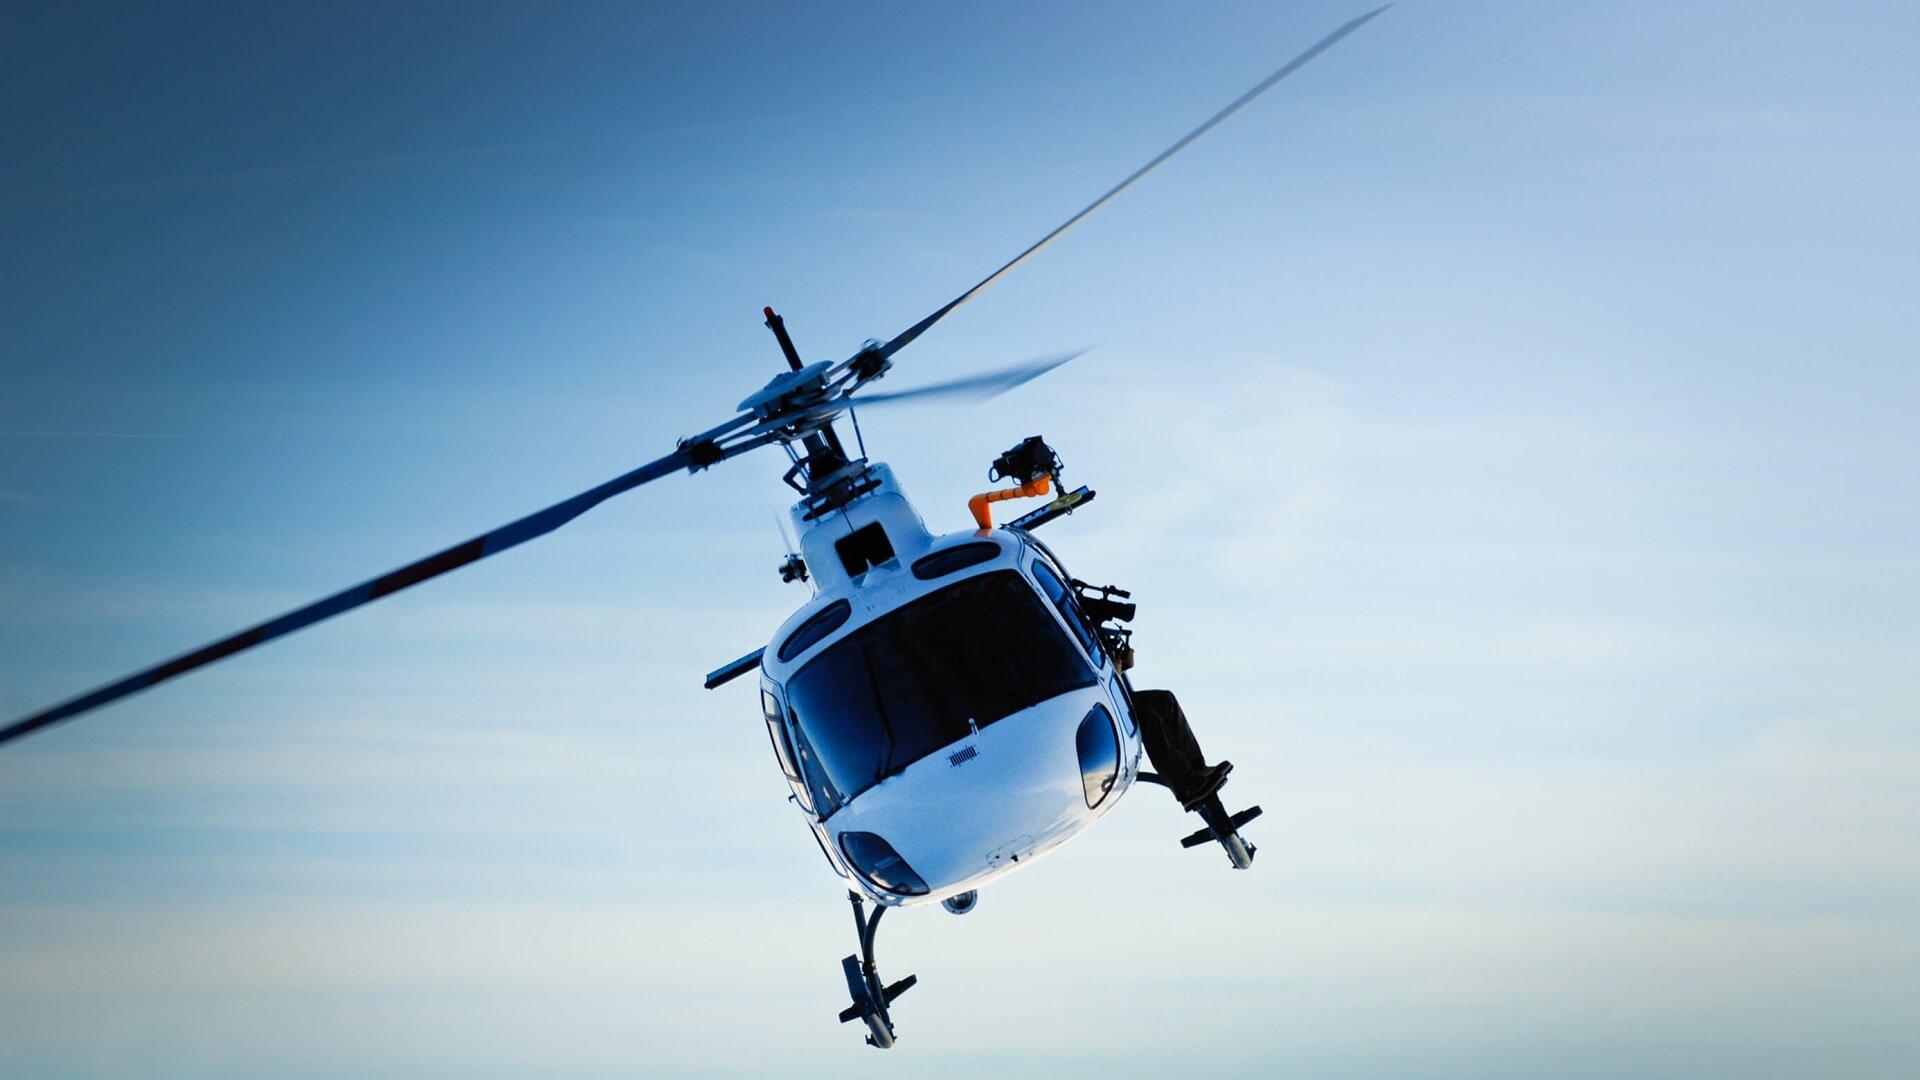 Loty helikopterem